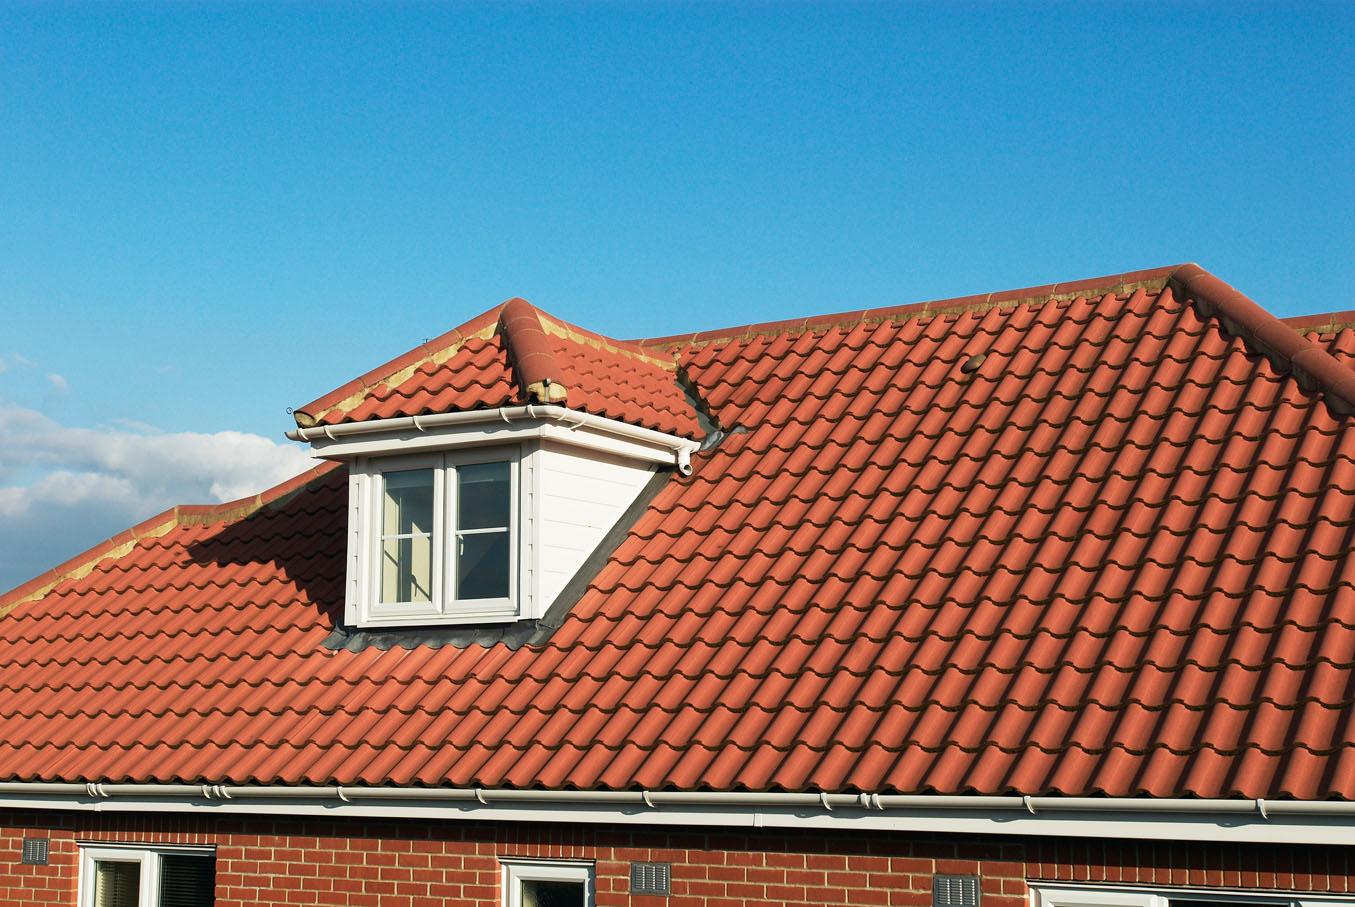 étanchéité du toit